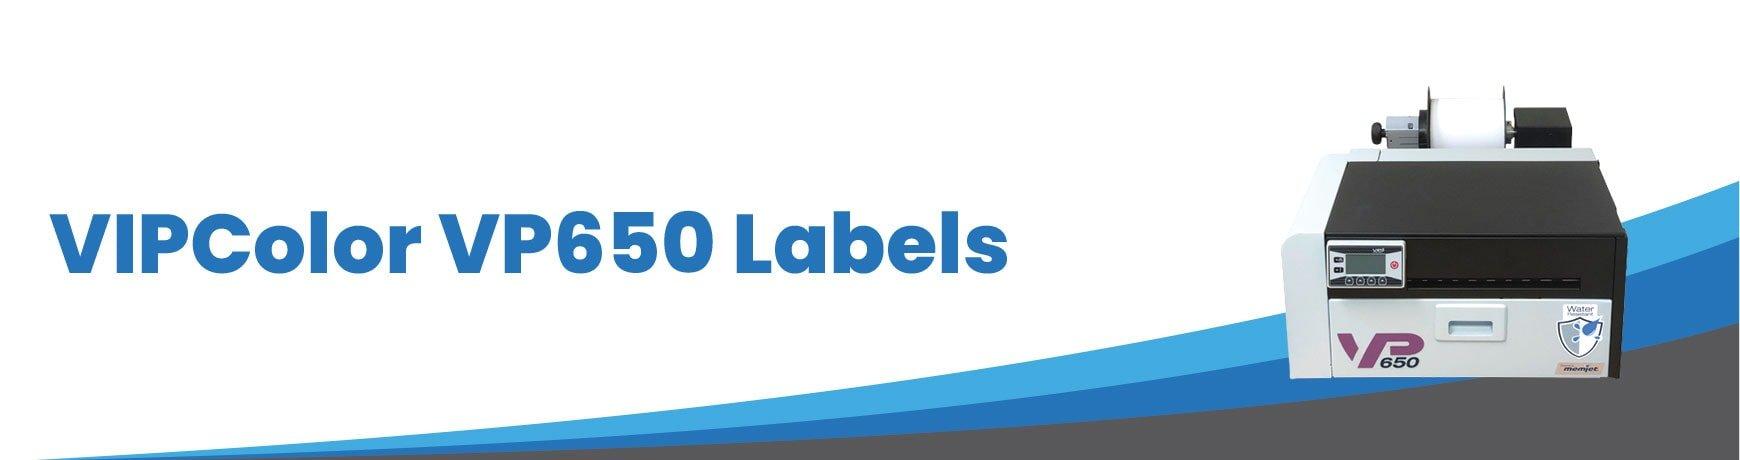 VIPColor VP650 Labels